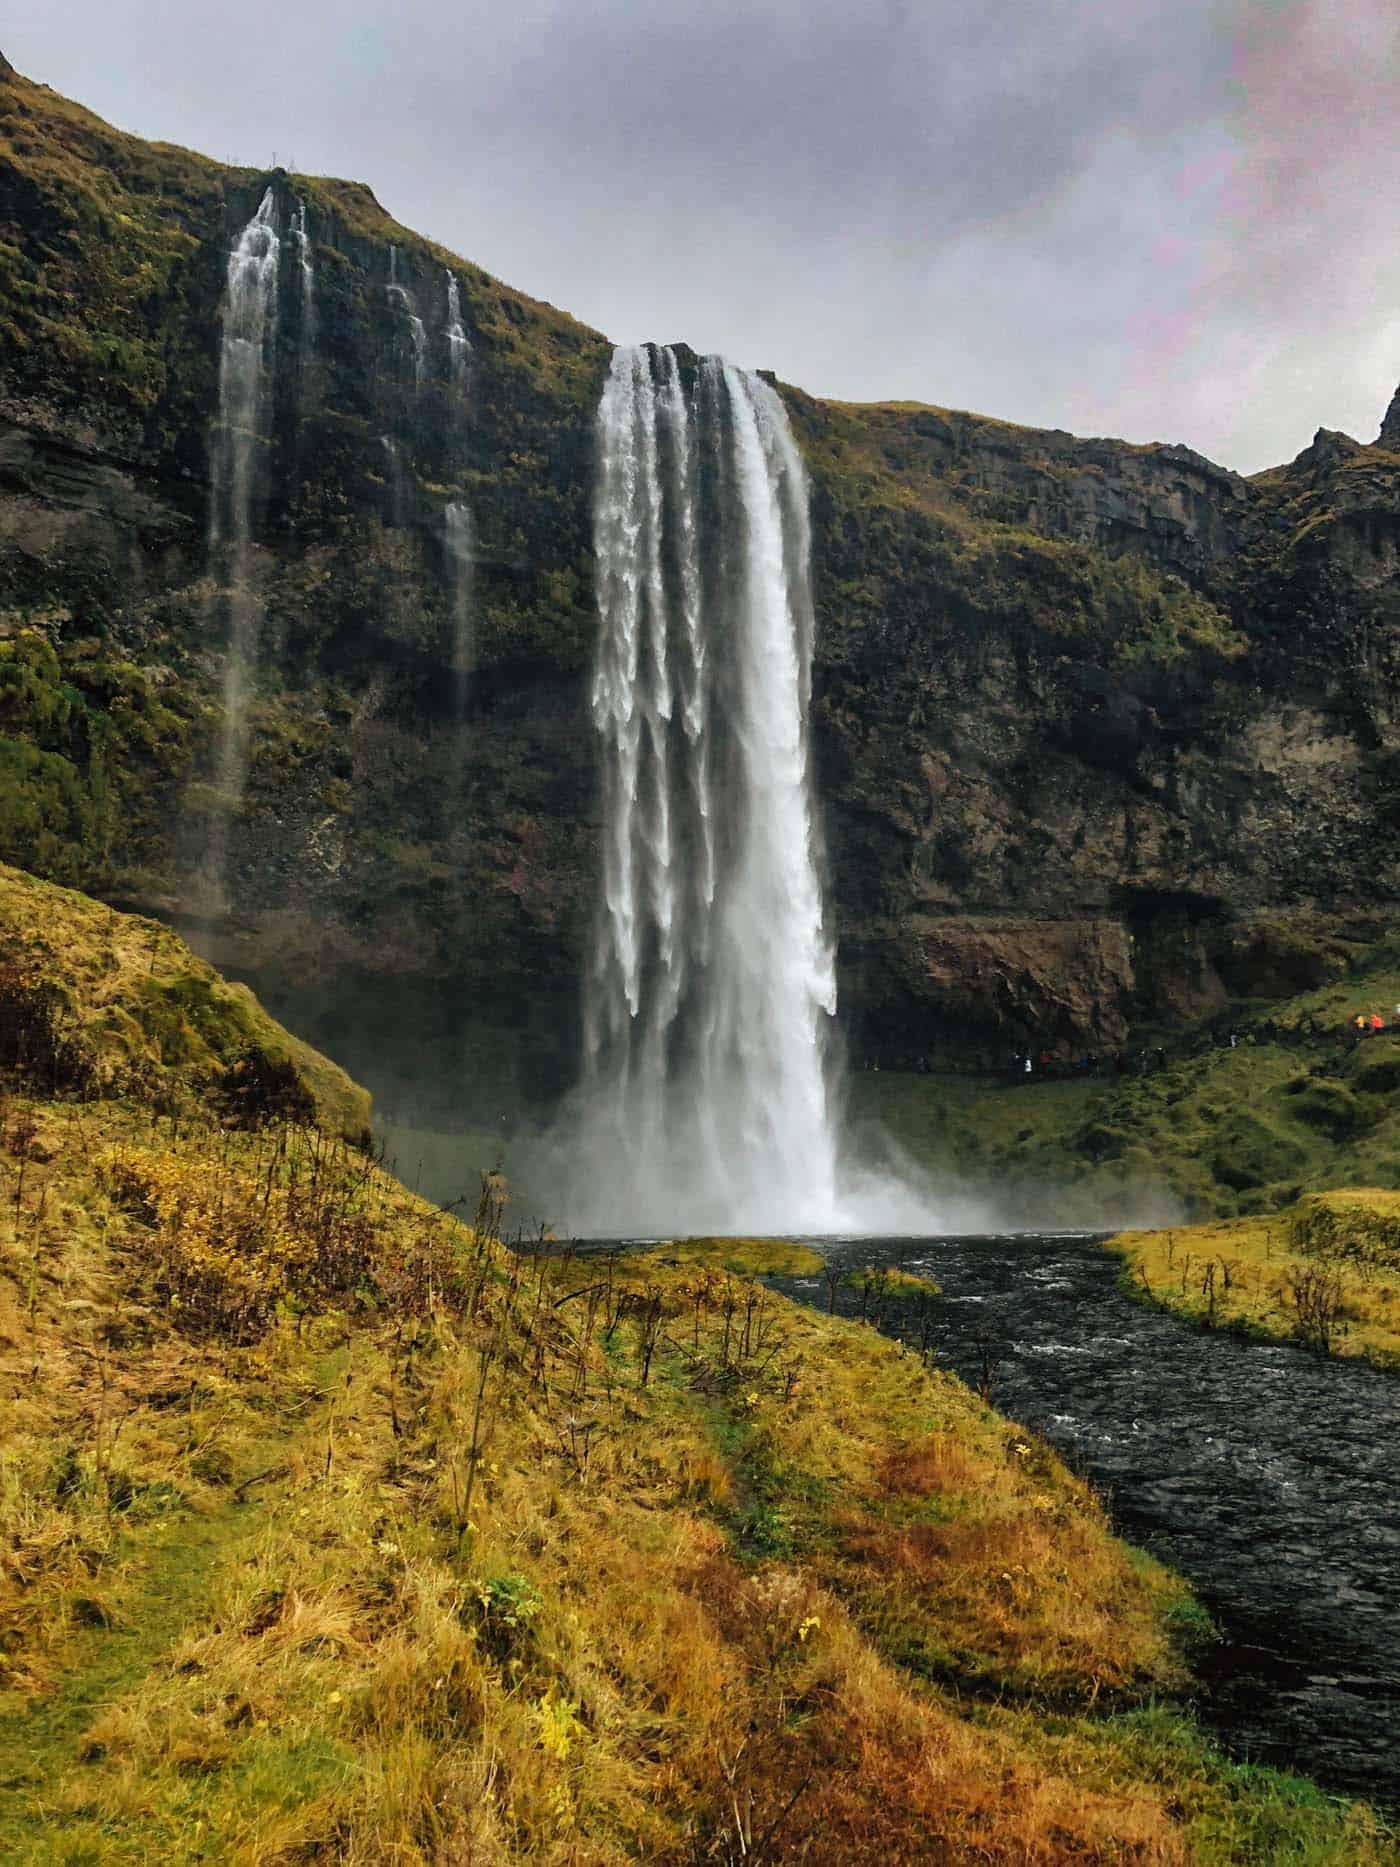 Seljalandsfoss waterfall in Iceland